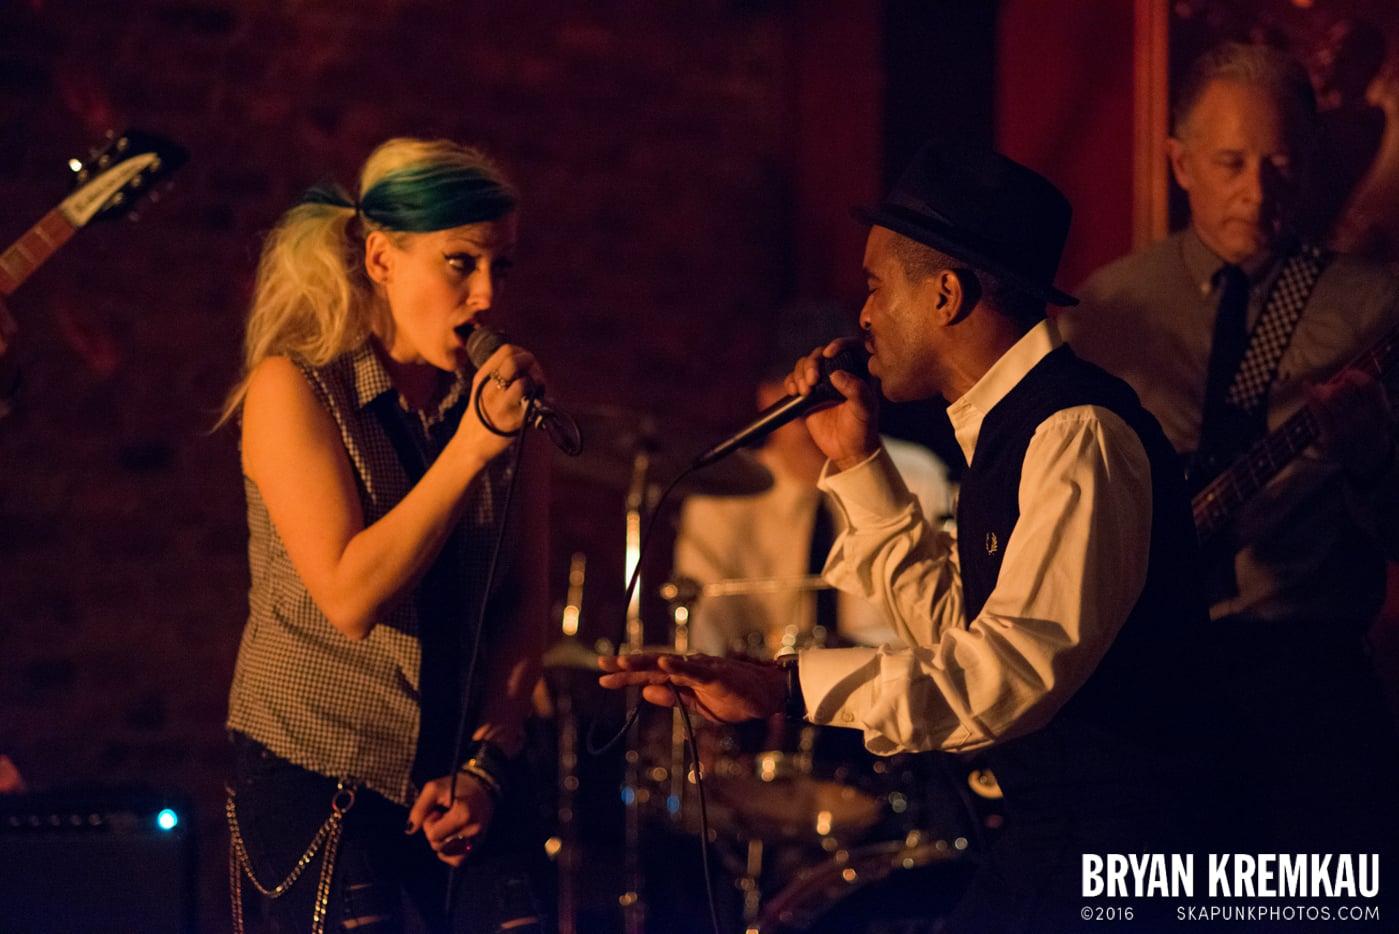 Rude Boy George @ Characters, NYC - 11.16.13 (4)